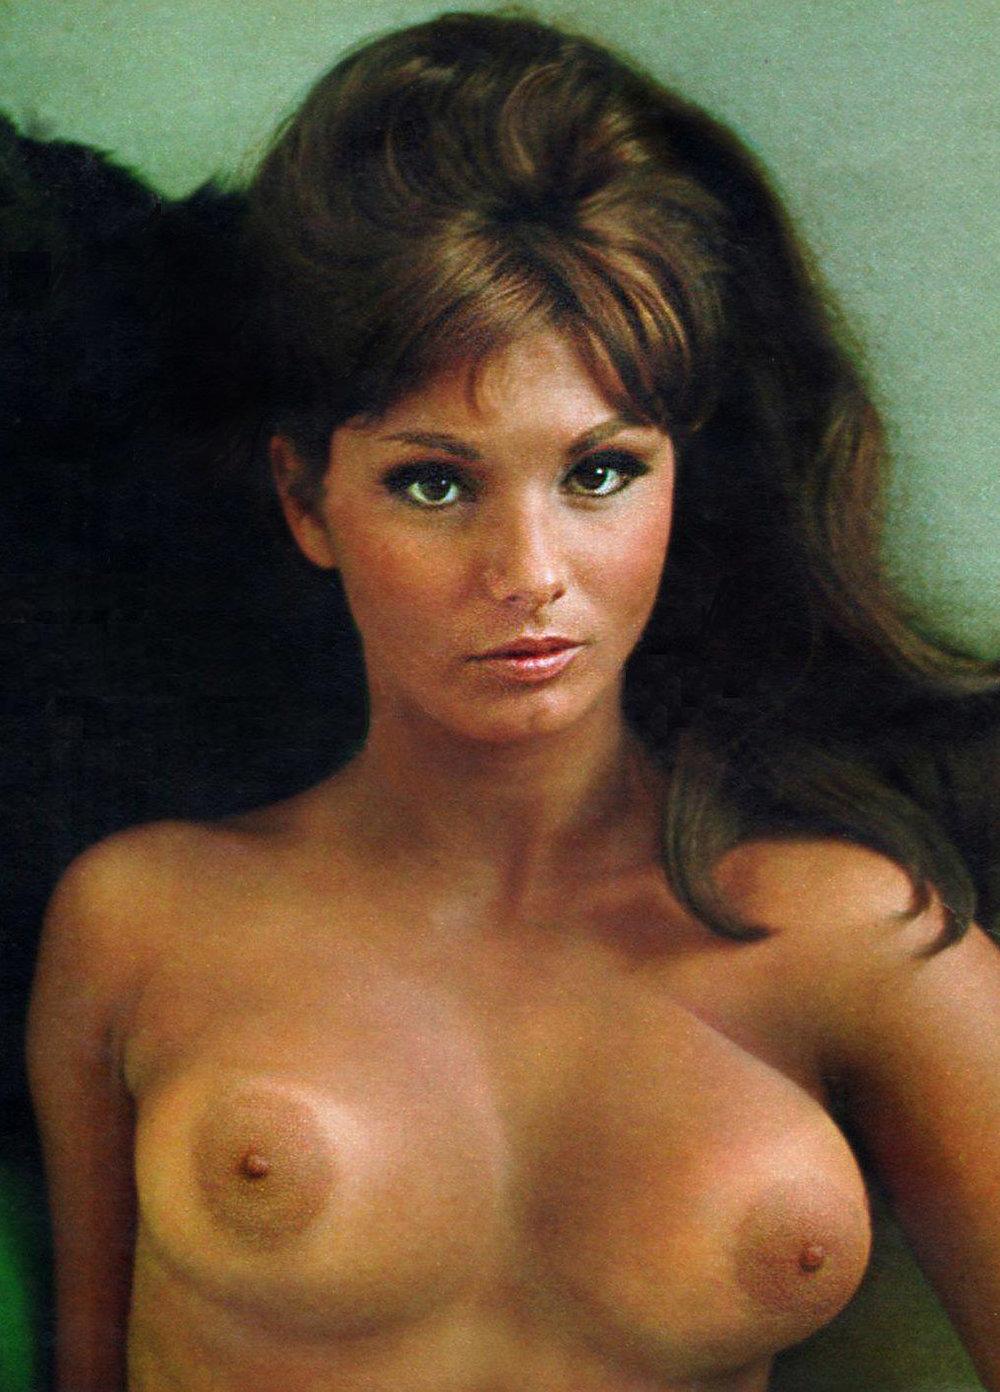 Angela-Dorian-aka-Victoria-Vetri-playboy-1967.jpg